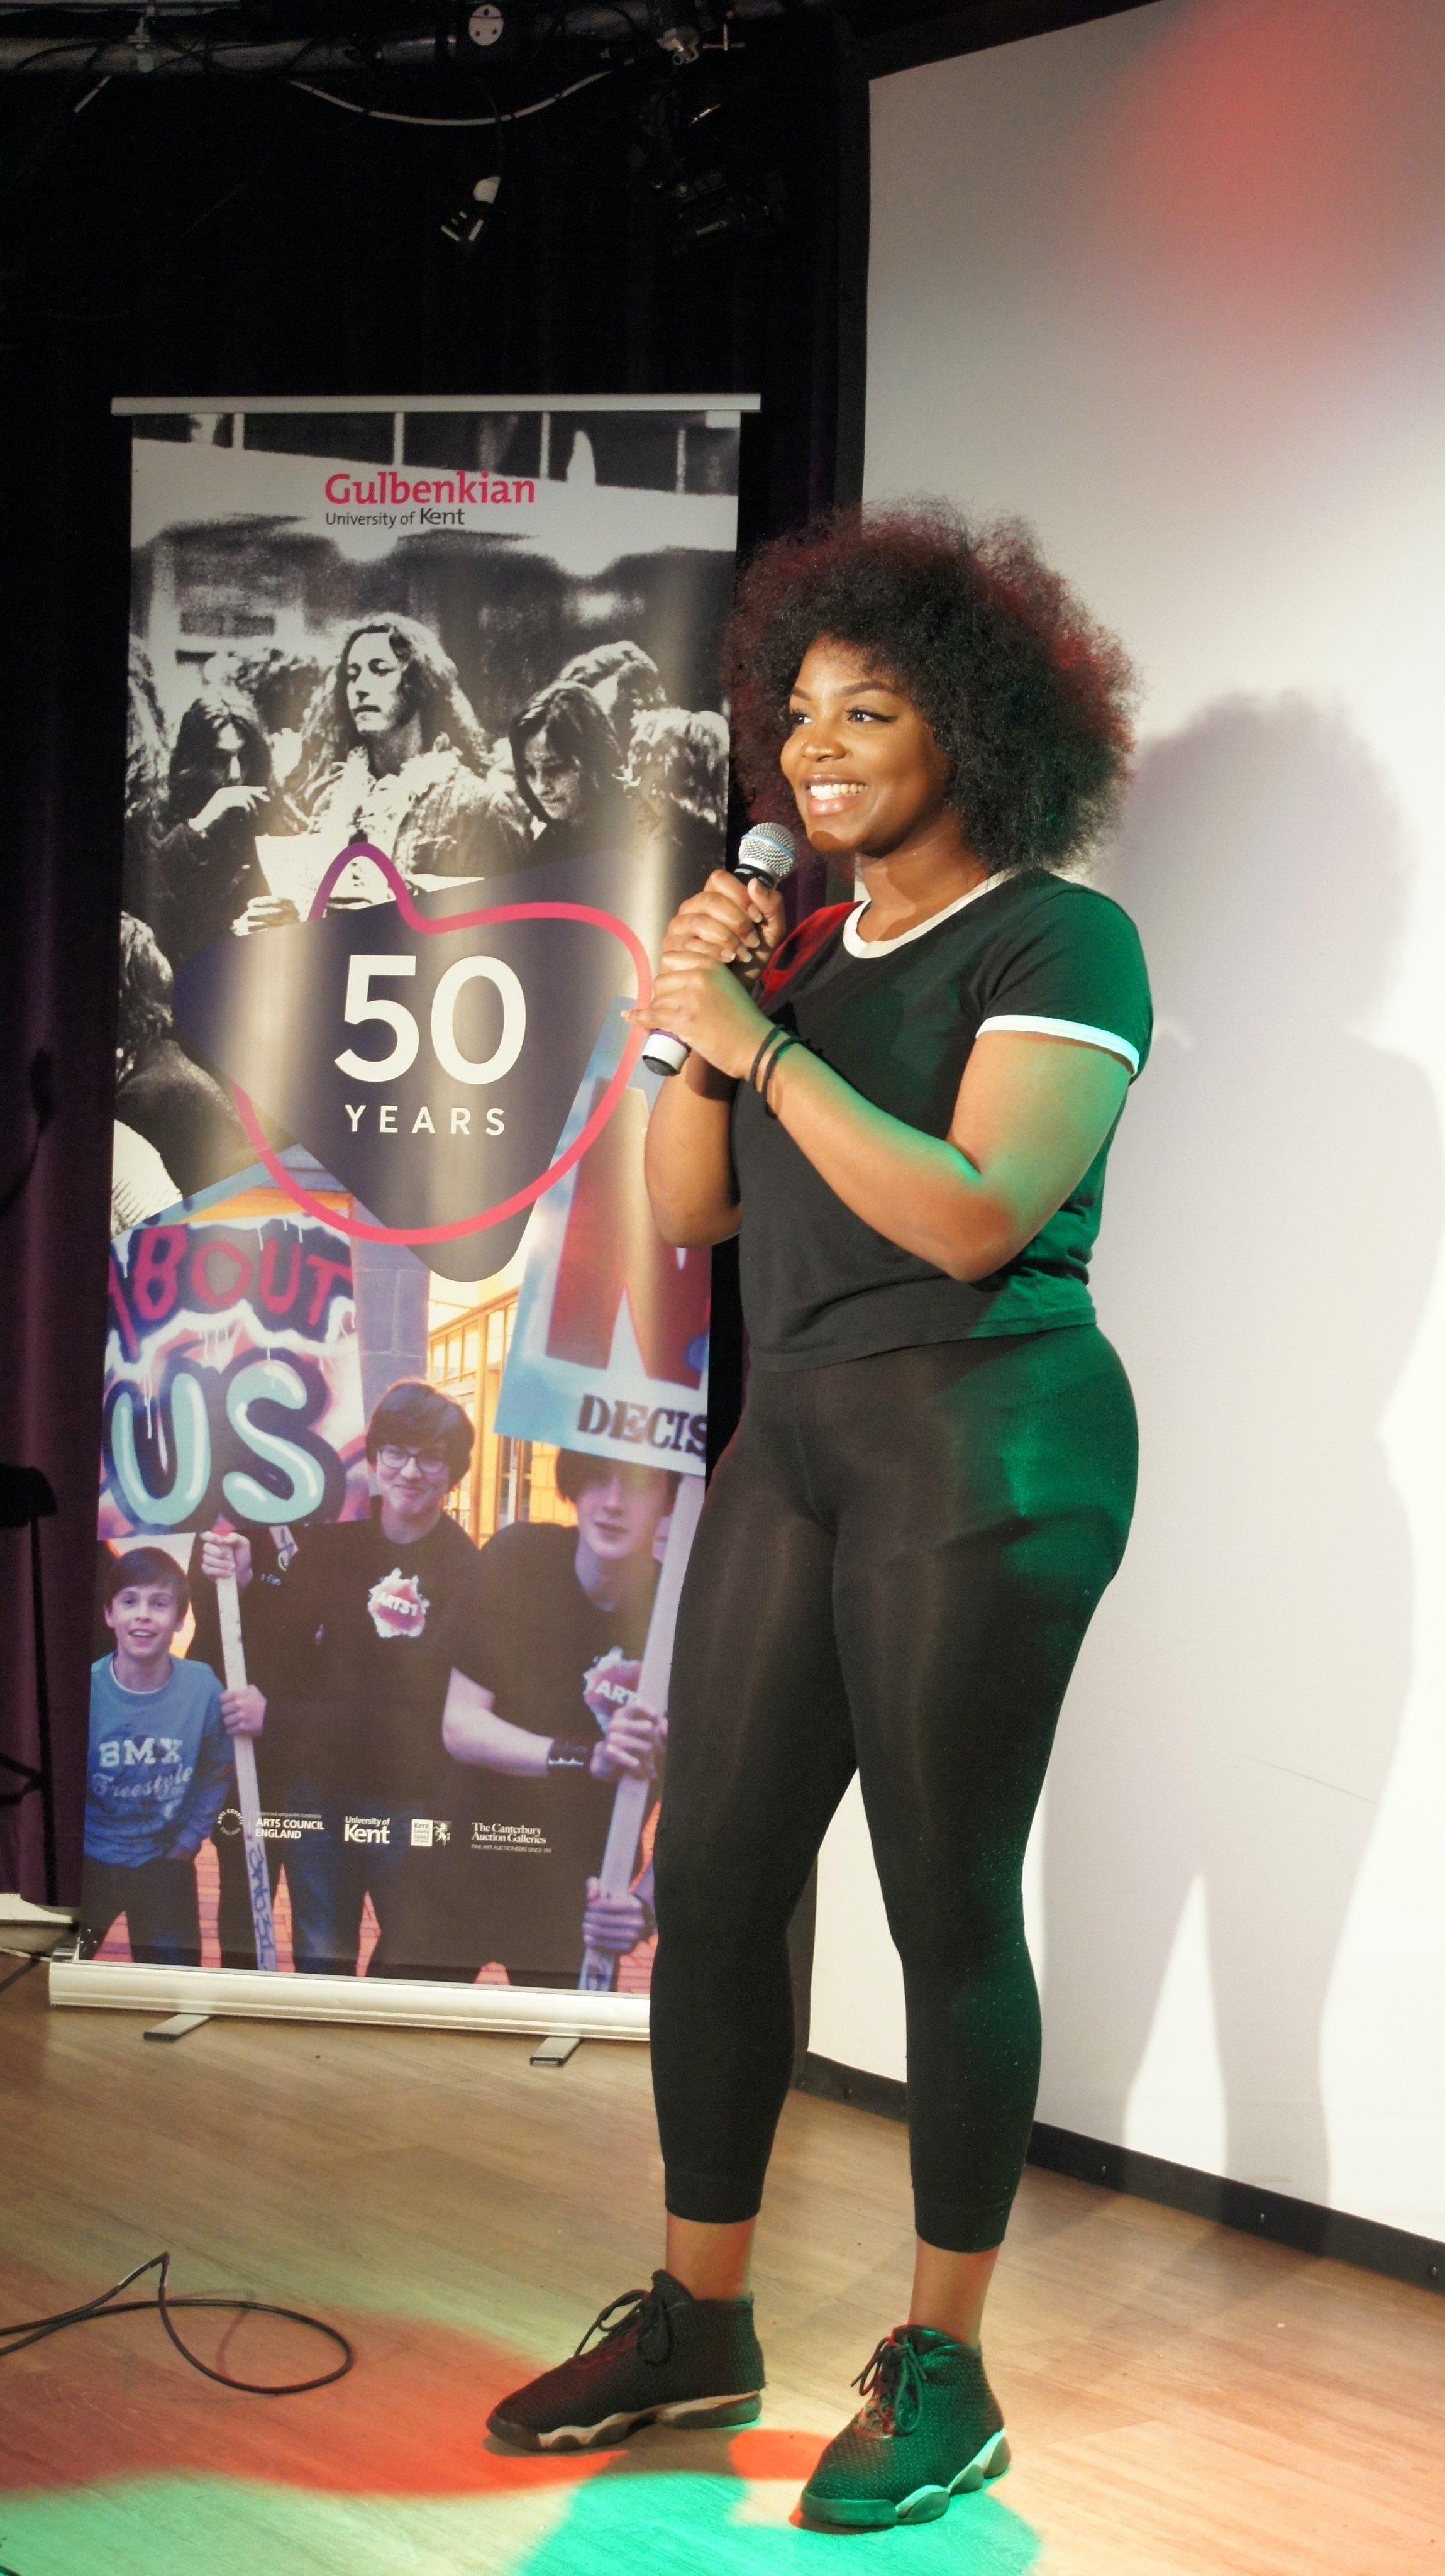 Drama grad Taylor Sonko - Garvey performs at Gulbenkian 50th anniversary celebrations